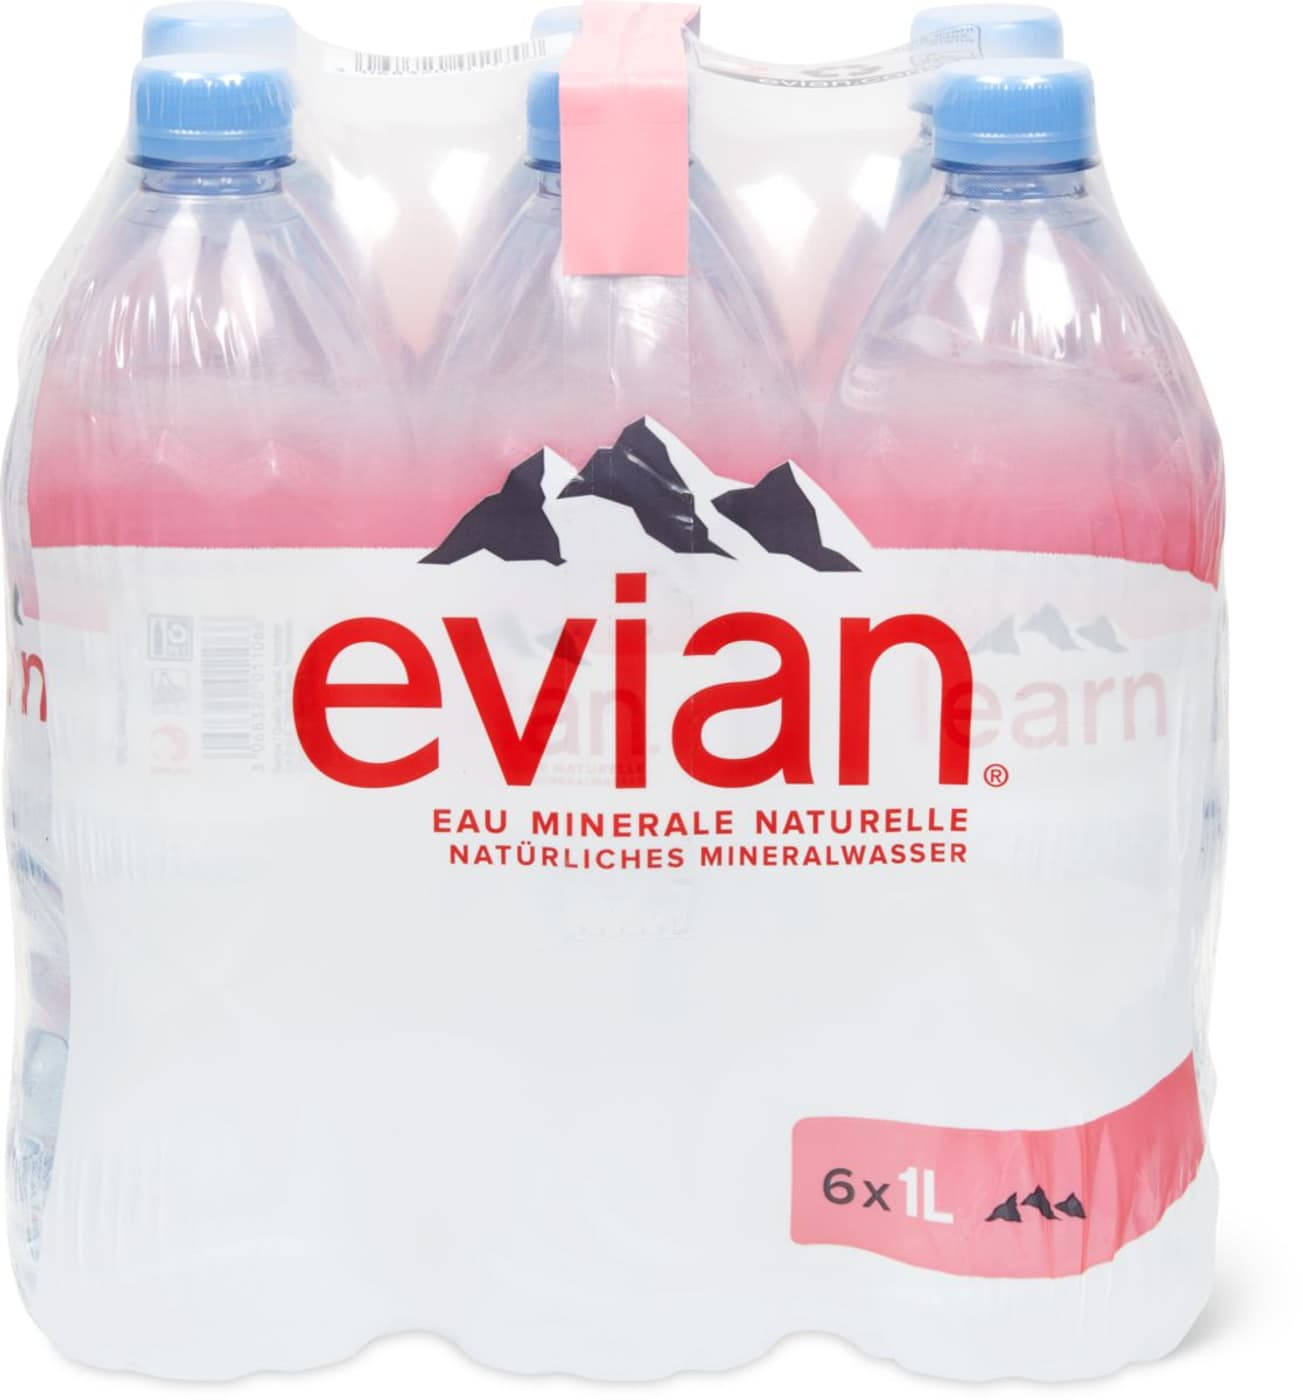 Calendrier Evian.Evian